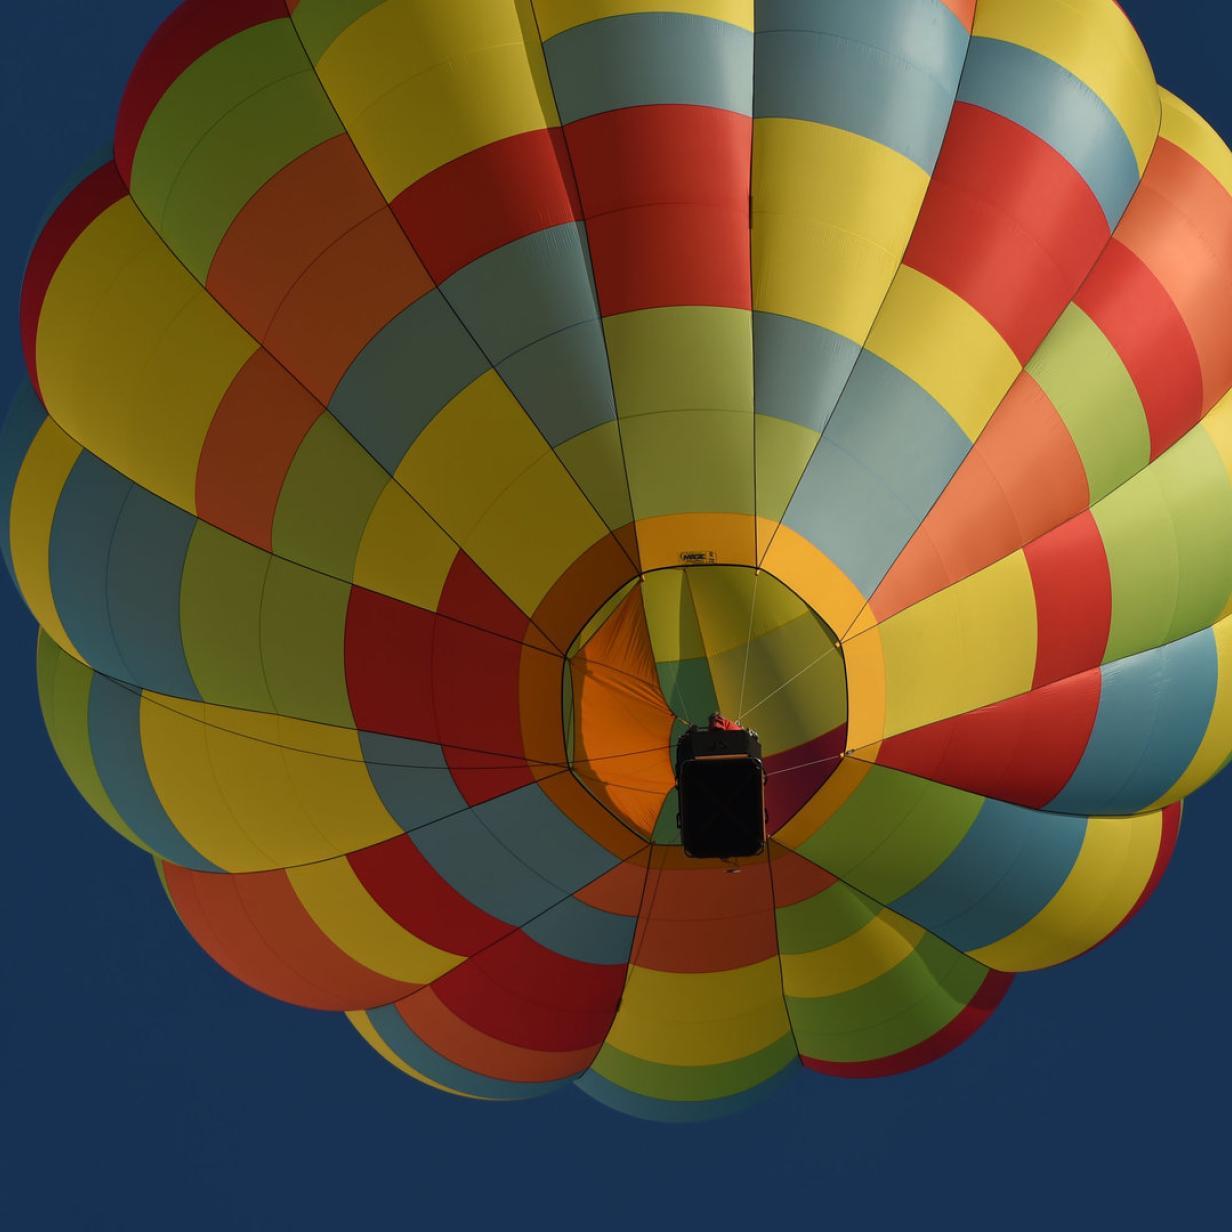 Heißluftballon musste auf Skipiste notlanden